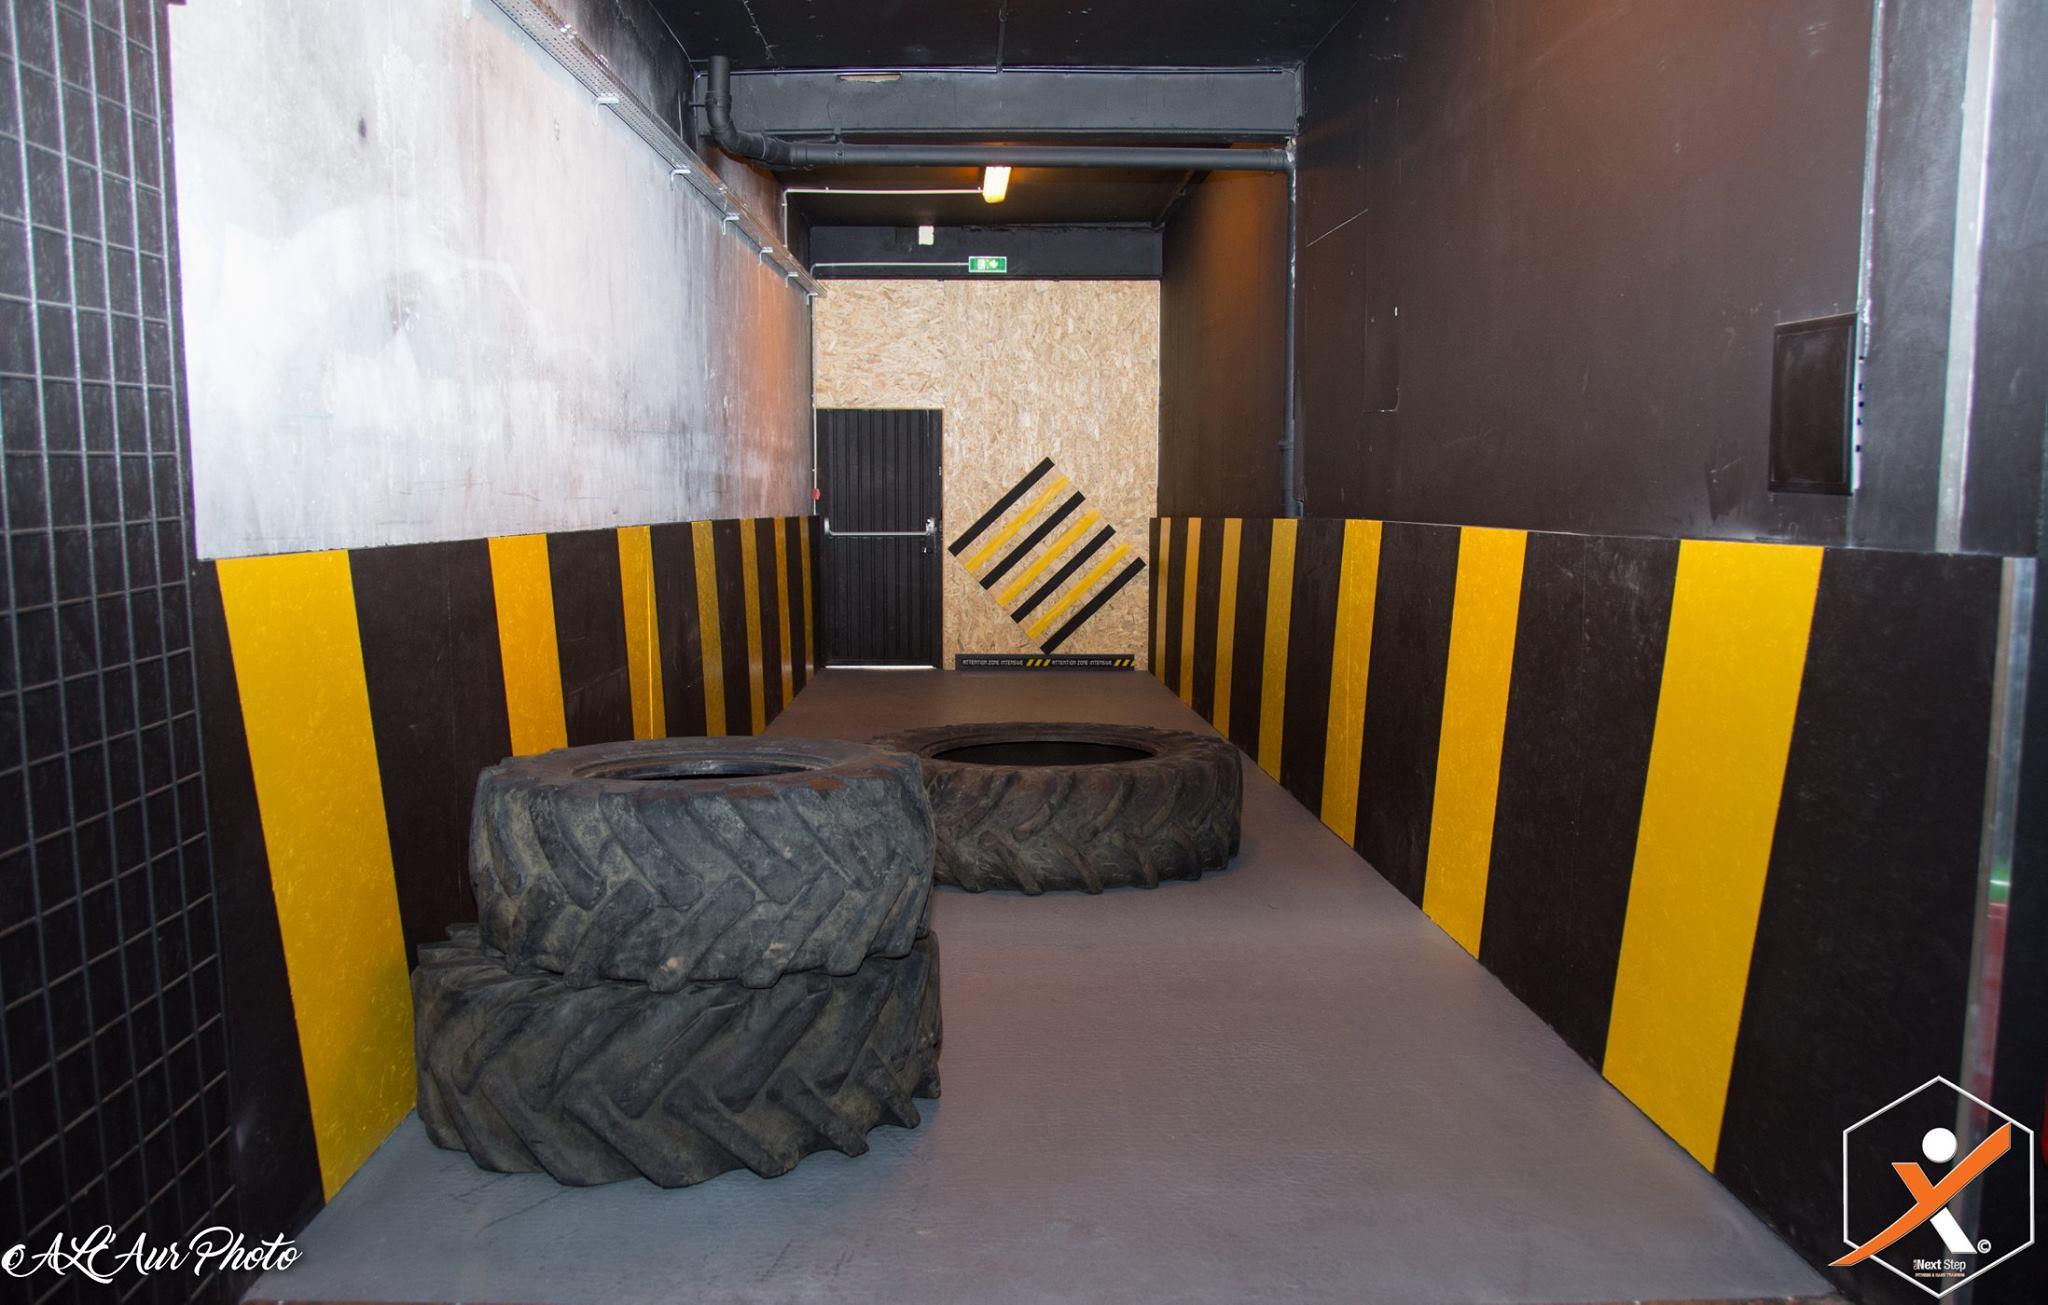 club next step gap salles de. Black Bedroom Furniture Sets. Home Design Ideas